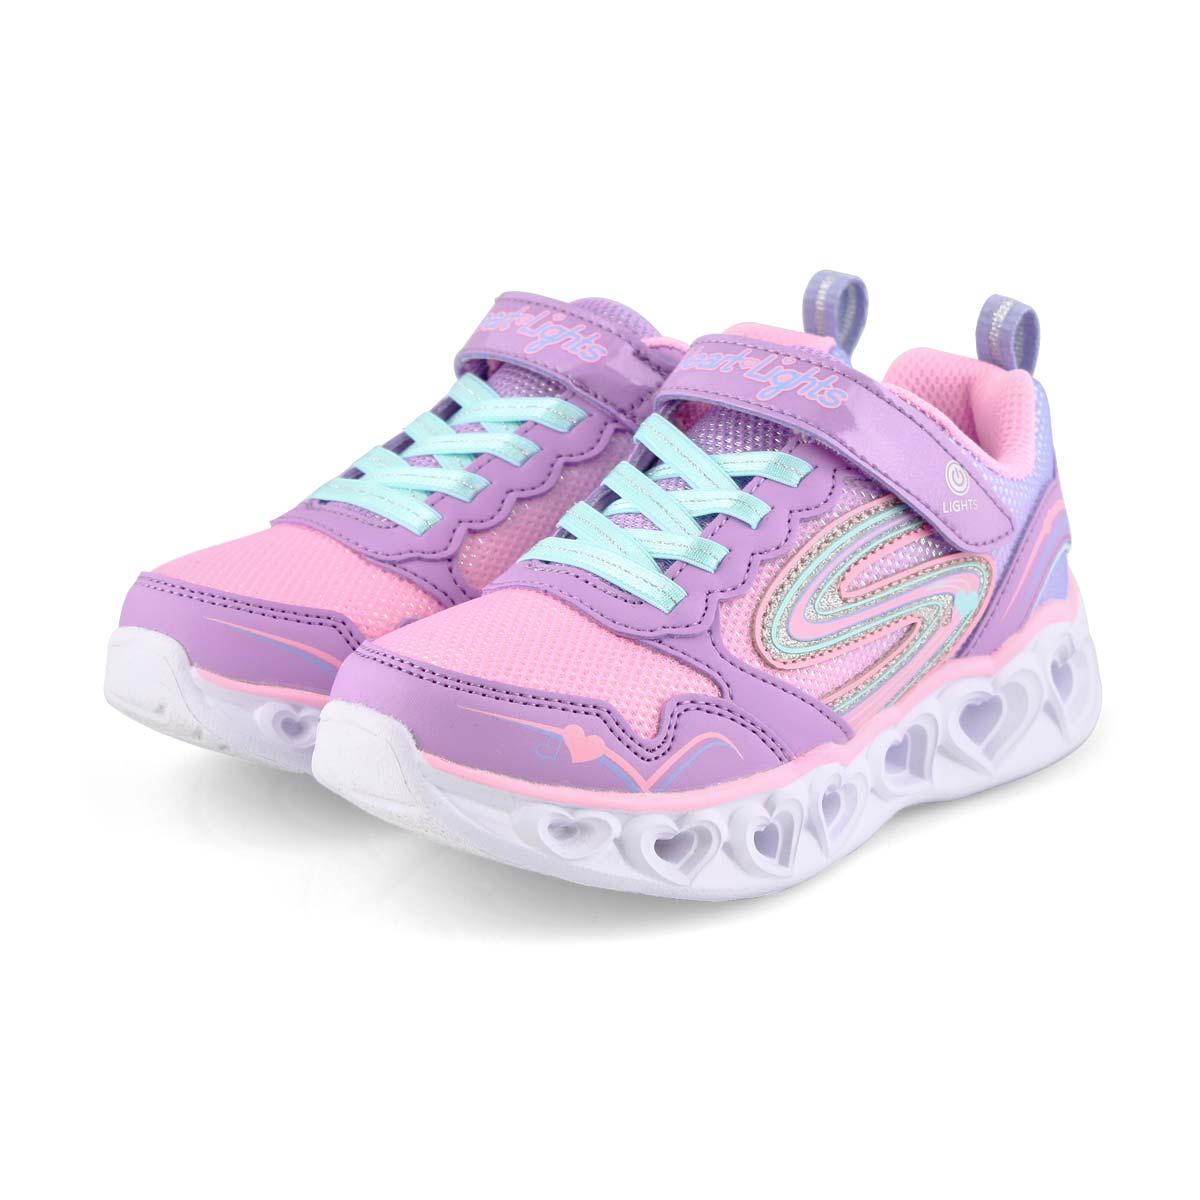 Girls' Heart Lights Sneakers - Lavender/Multi